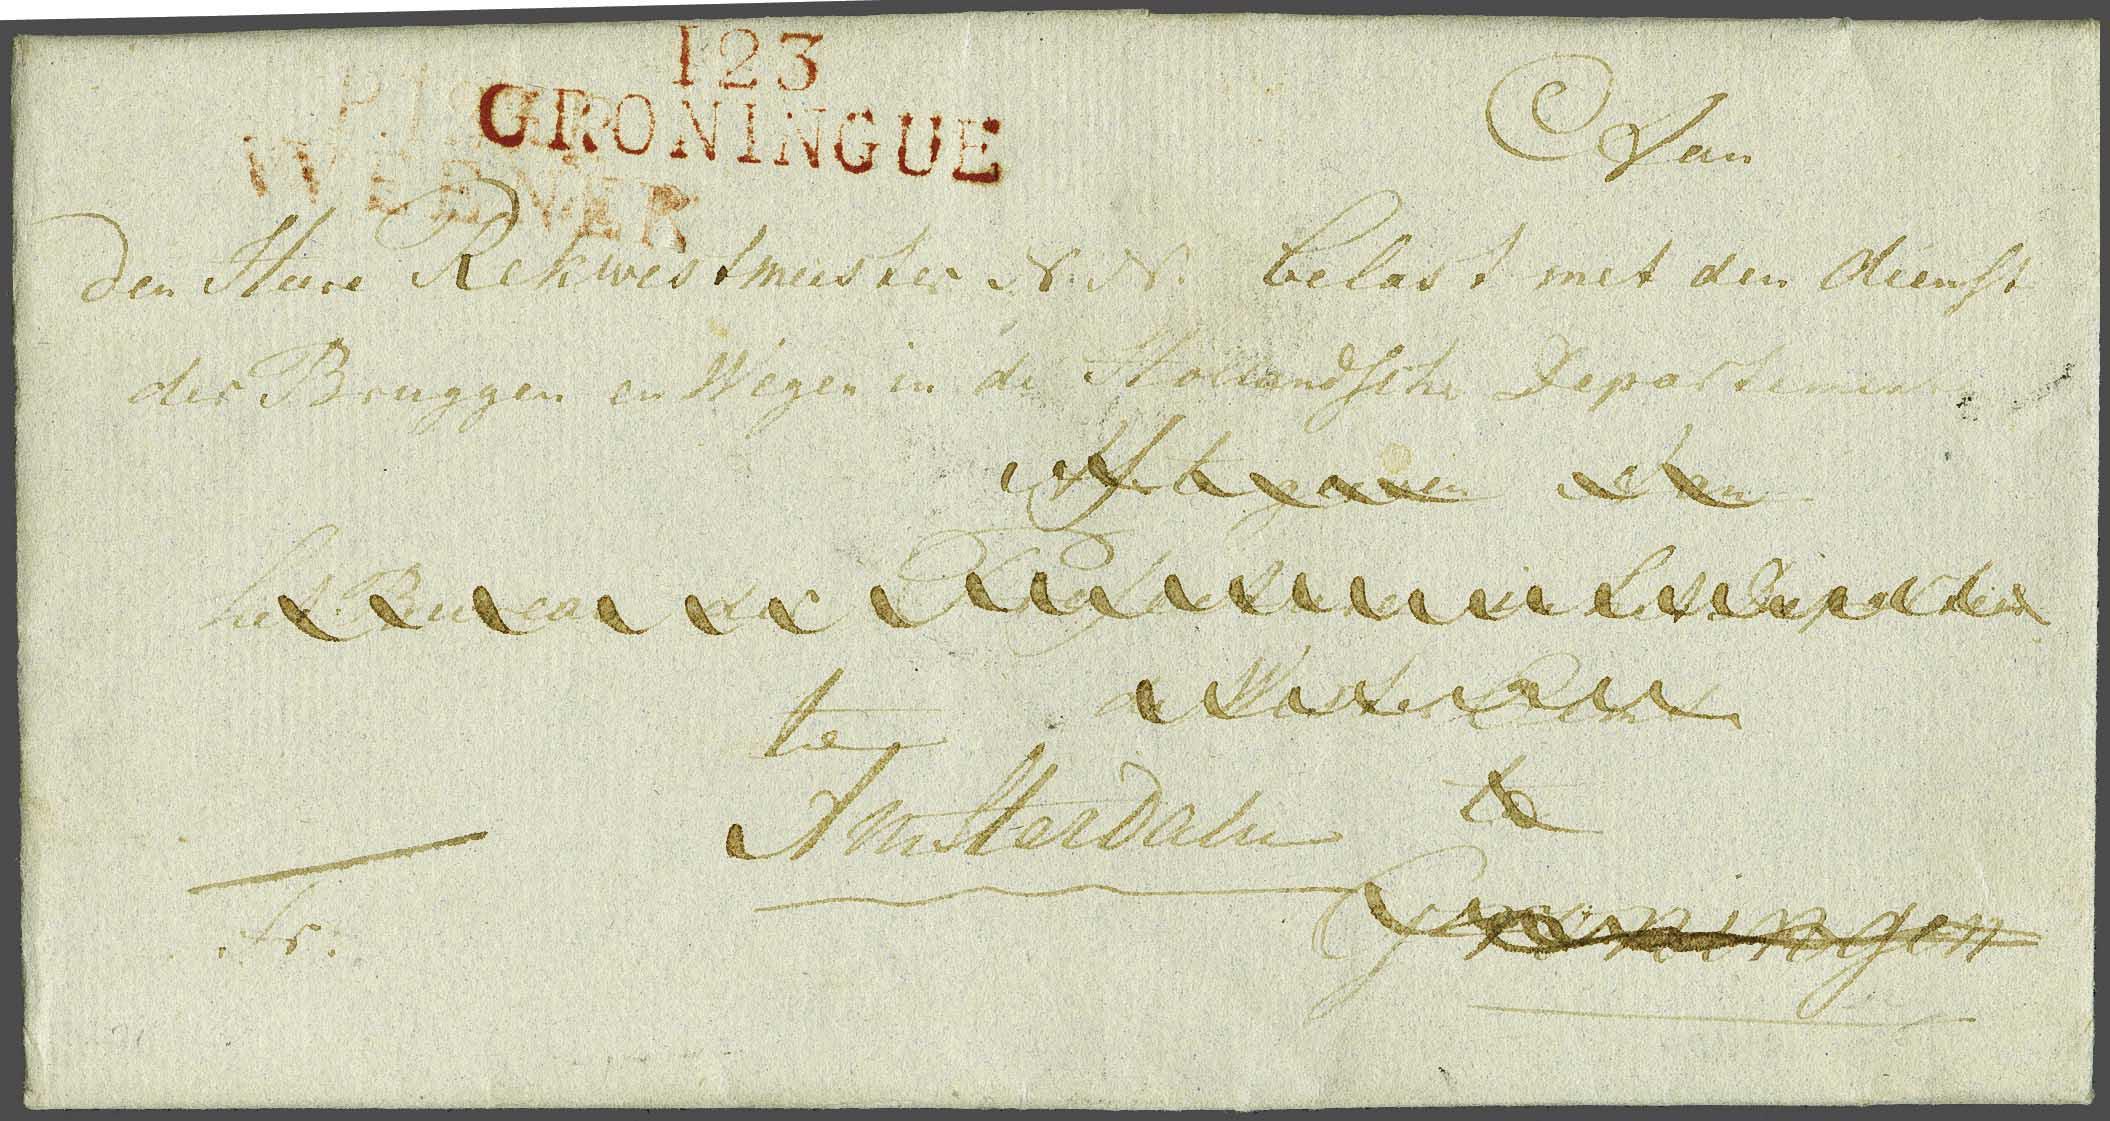 Lot 151 - Netherlands and Former Territories Netherlands -  Corinphila veilingen Auction 233: General sale